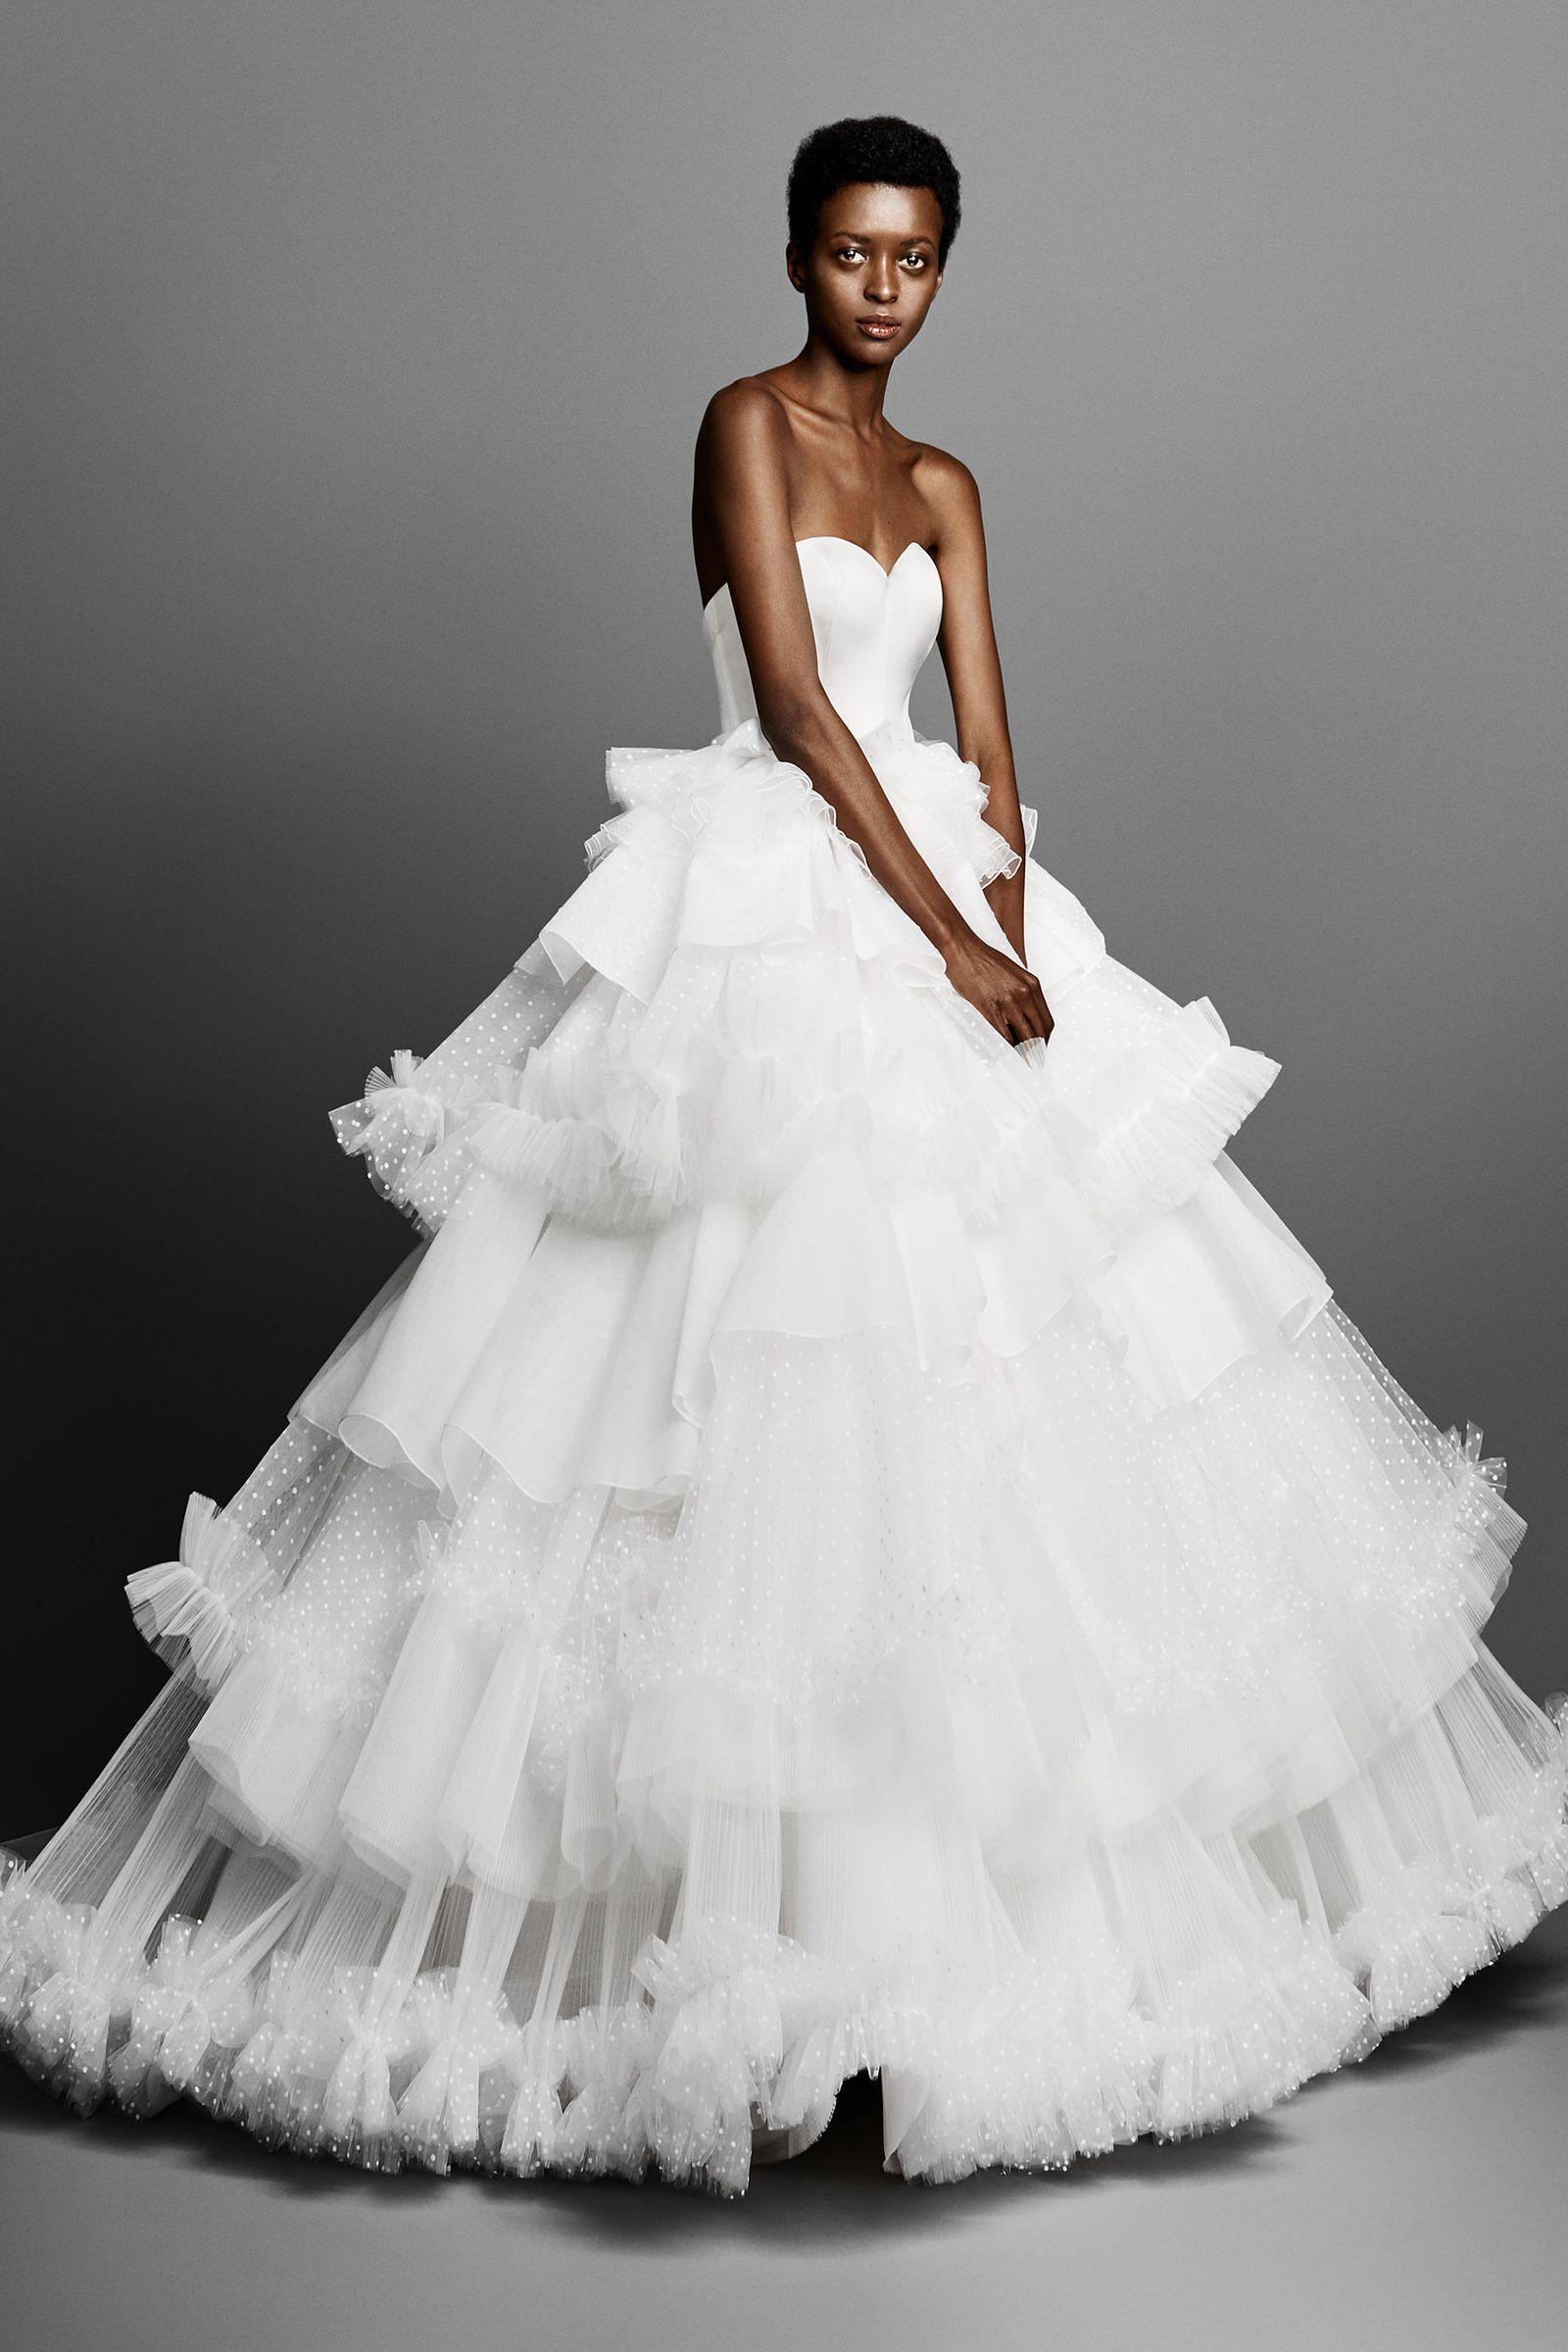 75b60c2c53b5 Viktor & Rolf Spring 2019. Viktor & Rolf Spring 2019 Wedding Dress Trends,  Princess Wedding Dresses, Best Wedding Dresses